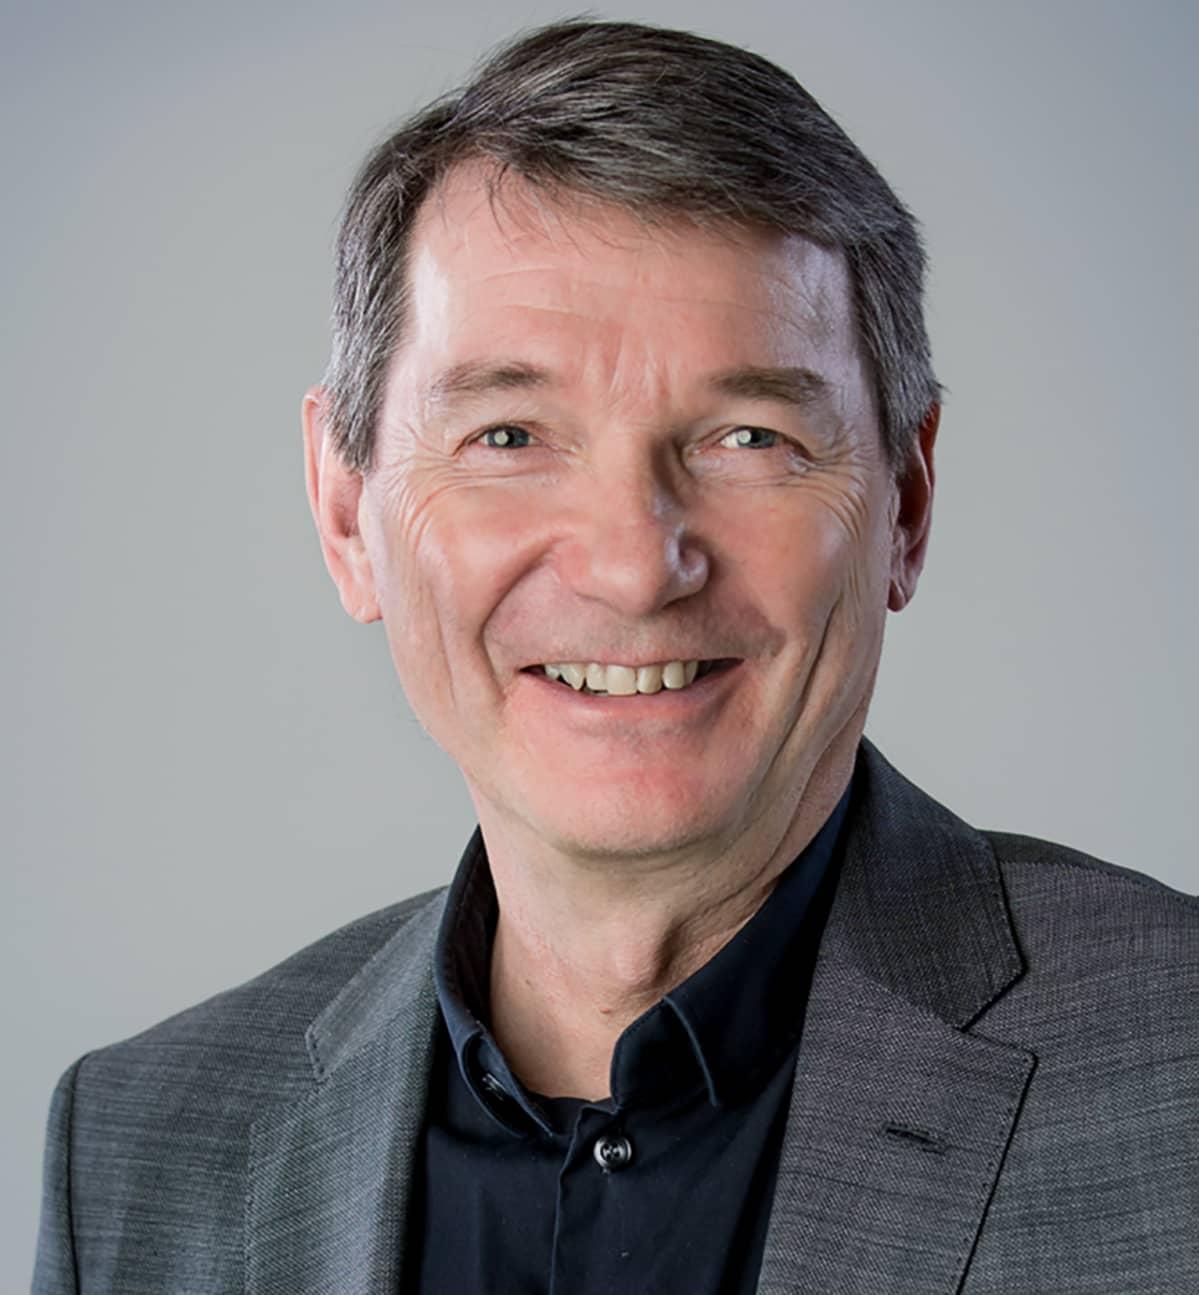 Markku Jalkanen